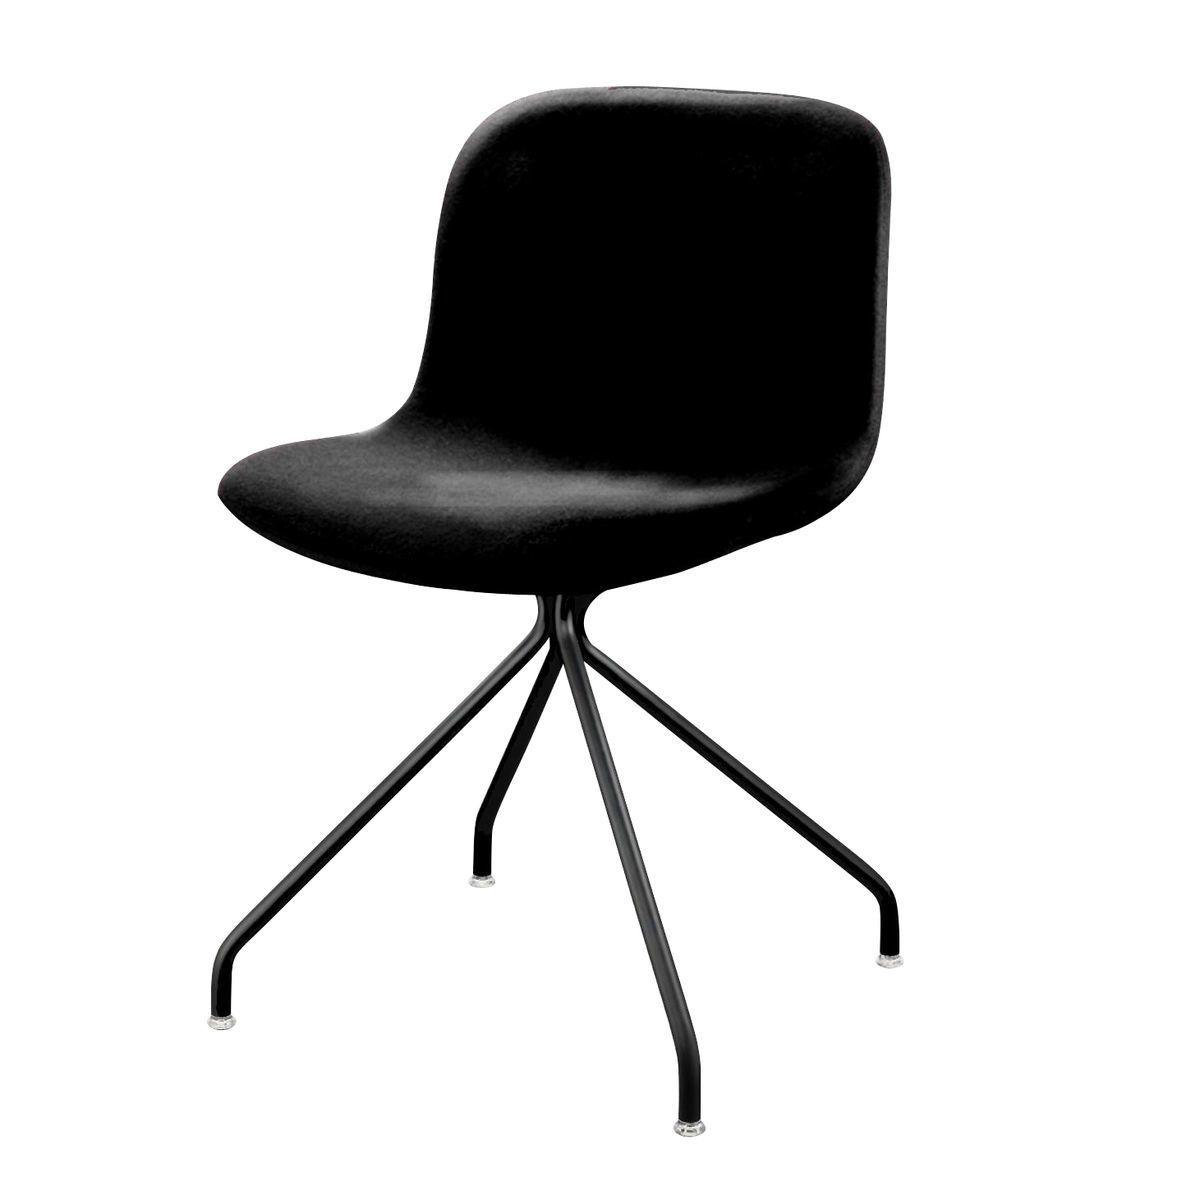 Magis   Magis Troy Chair 4 Star   Black/Polypropylene Seat Shell